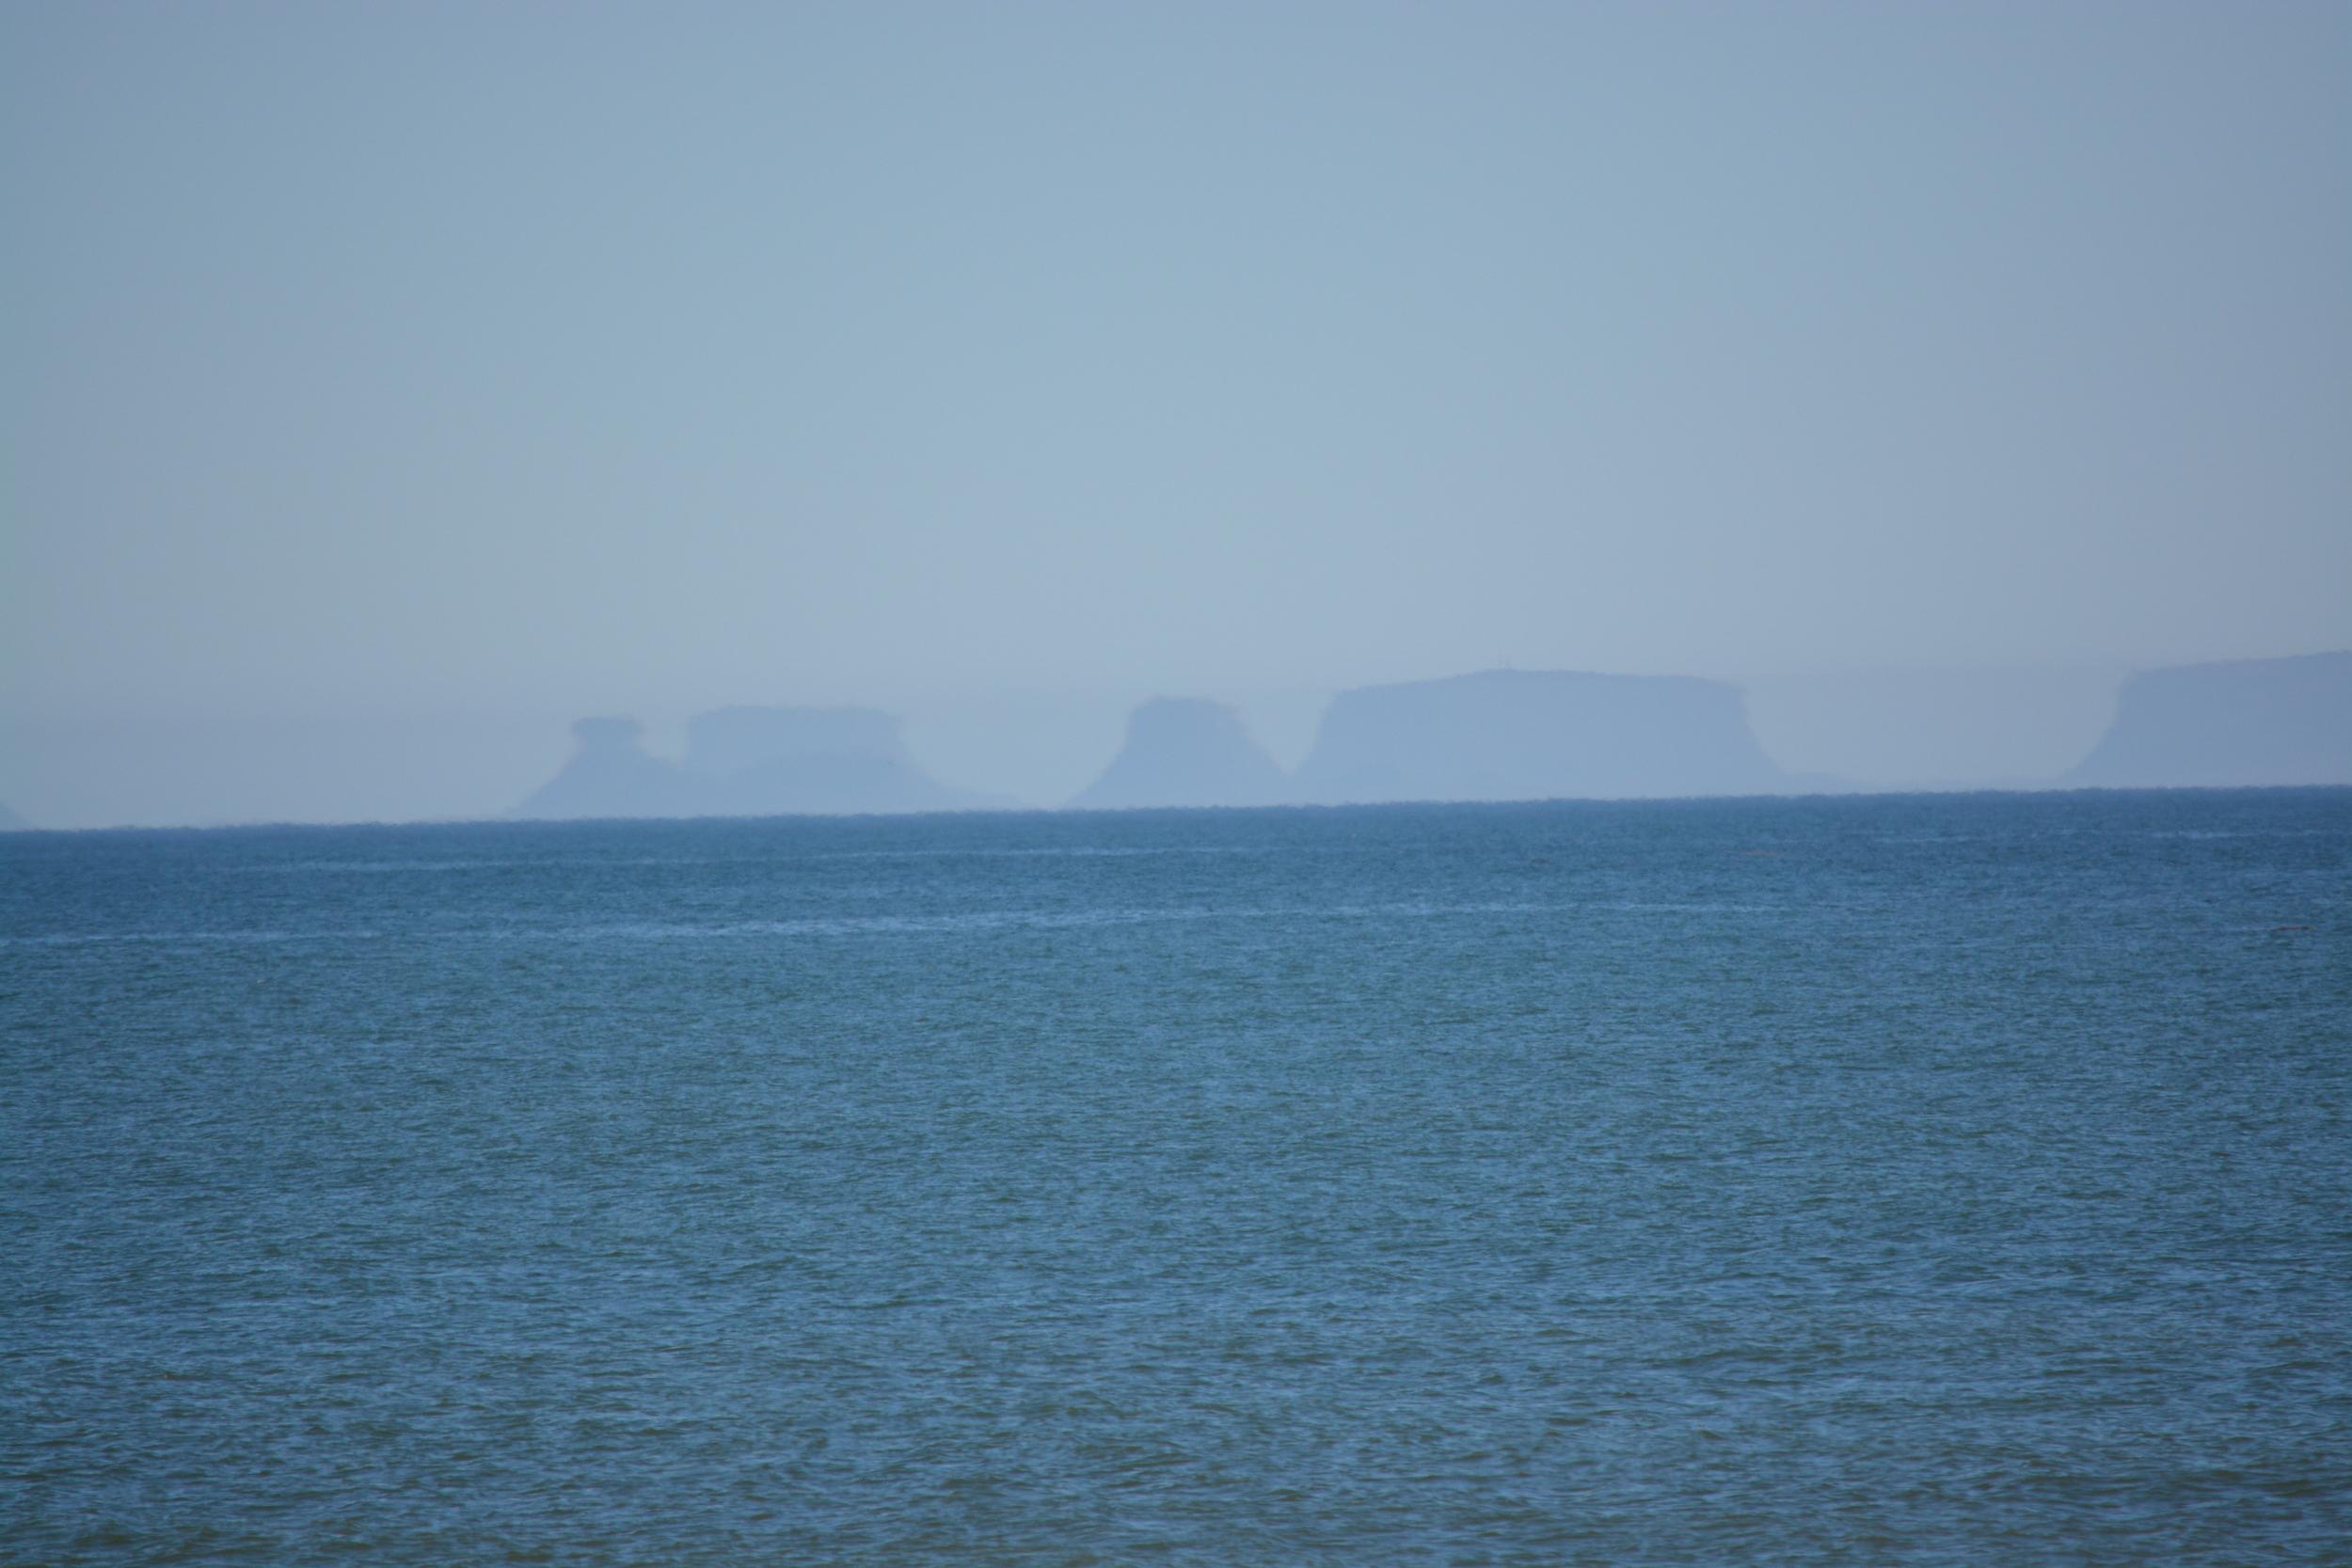 Baja California 10-5-13 Shipwrecks Surfing Adventure Ocean Experience Surf School San Diego (81).JPG